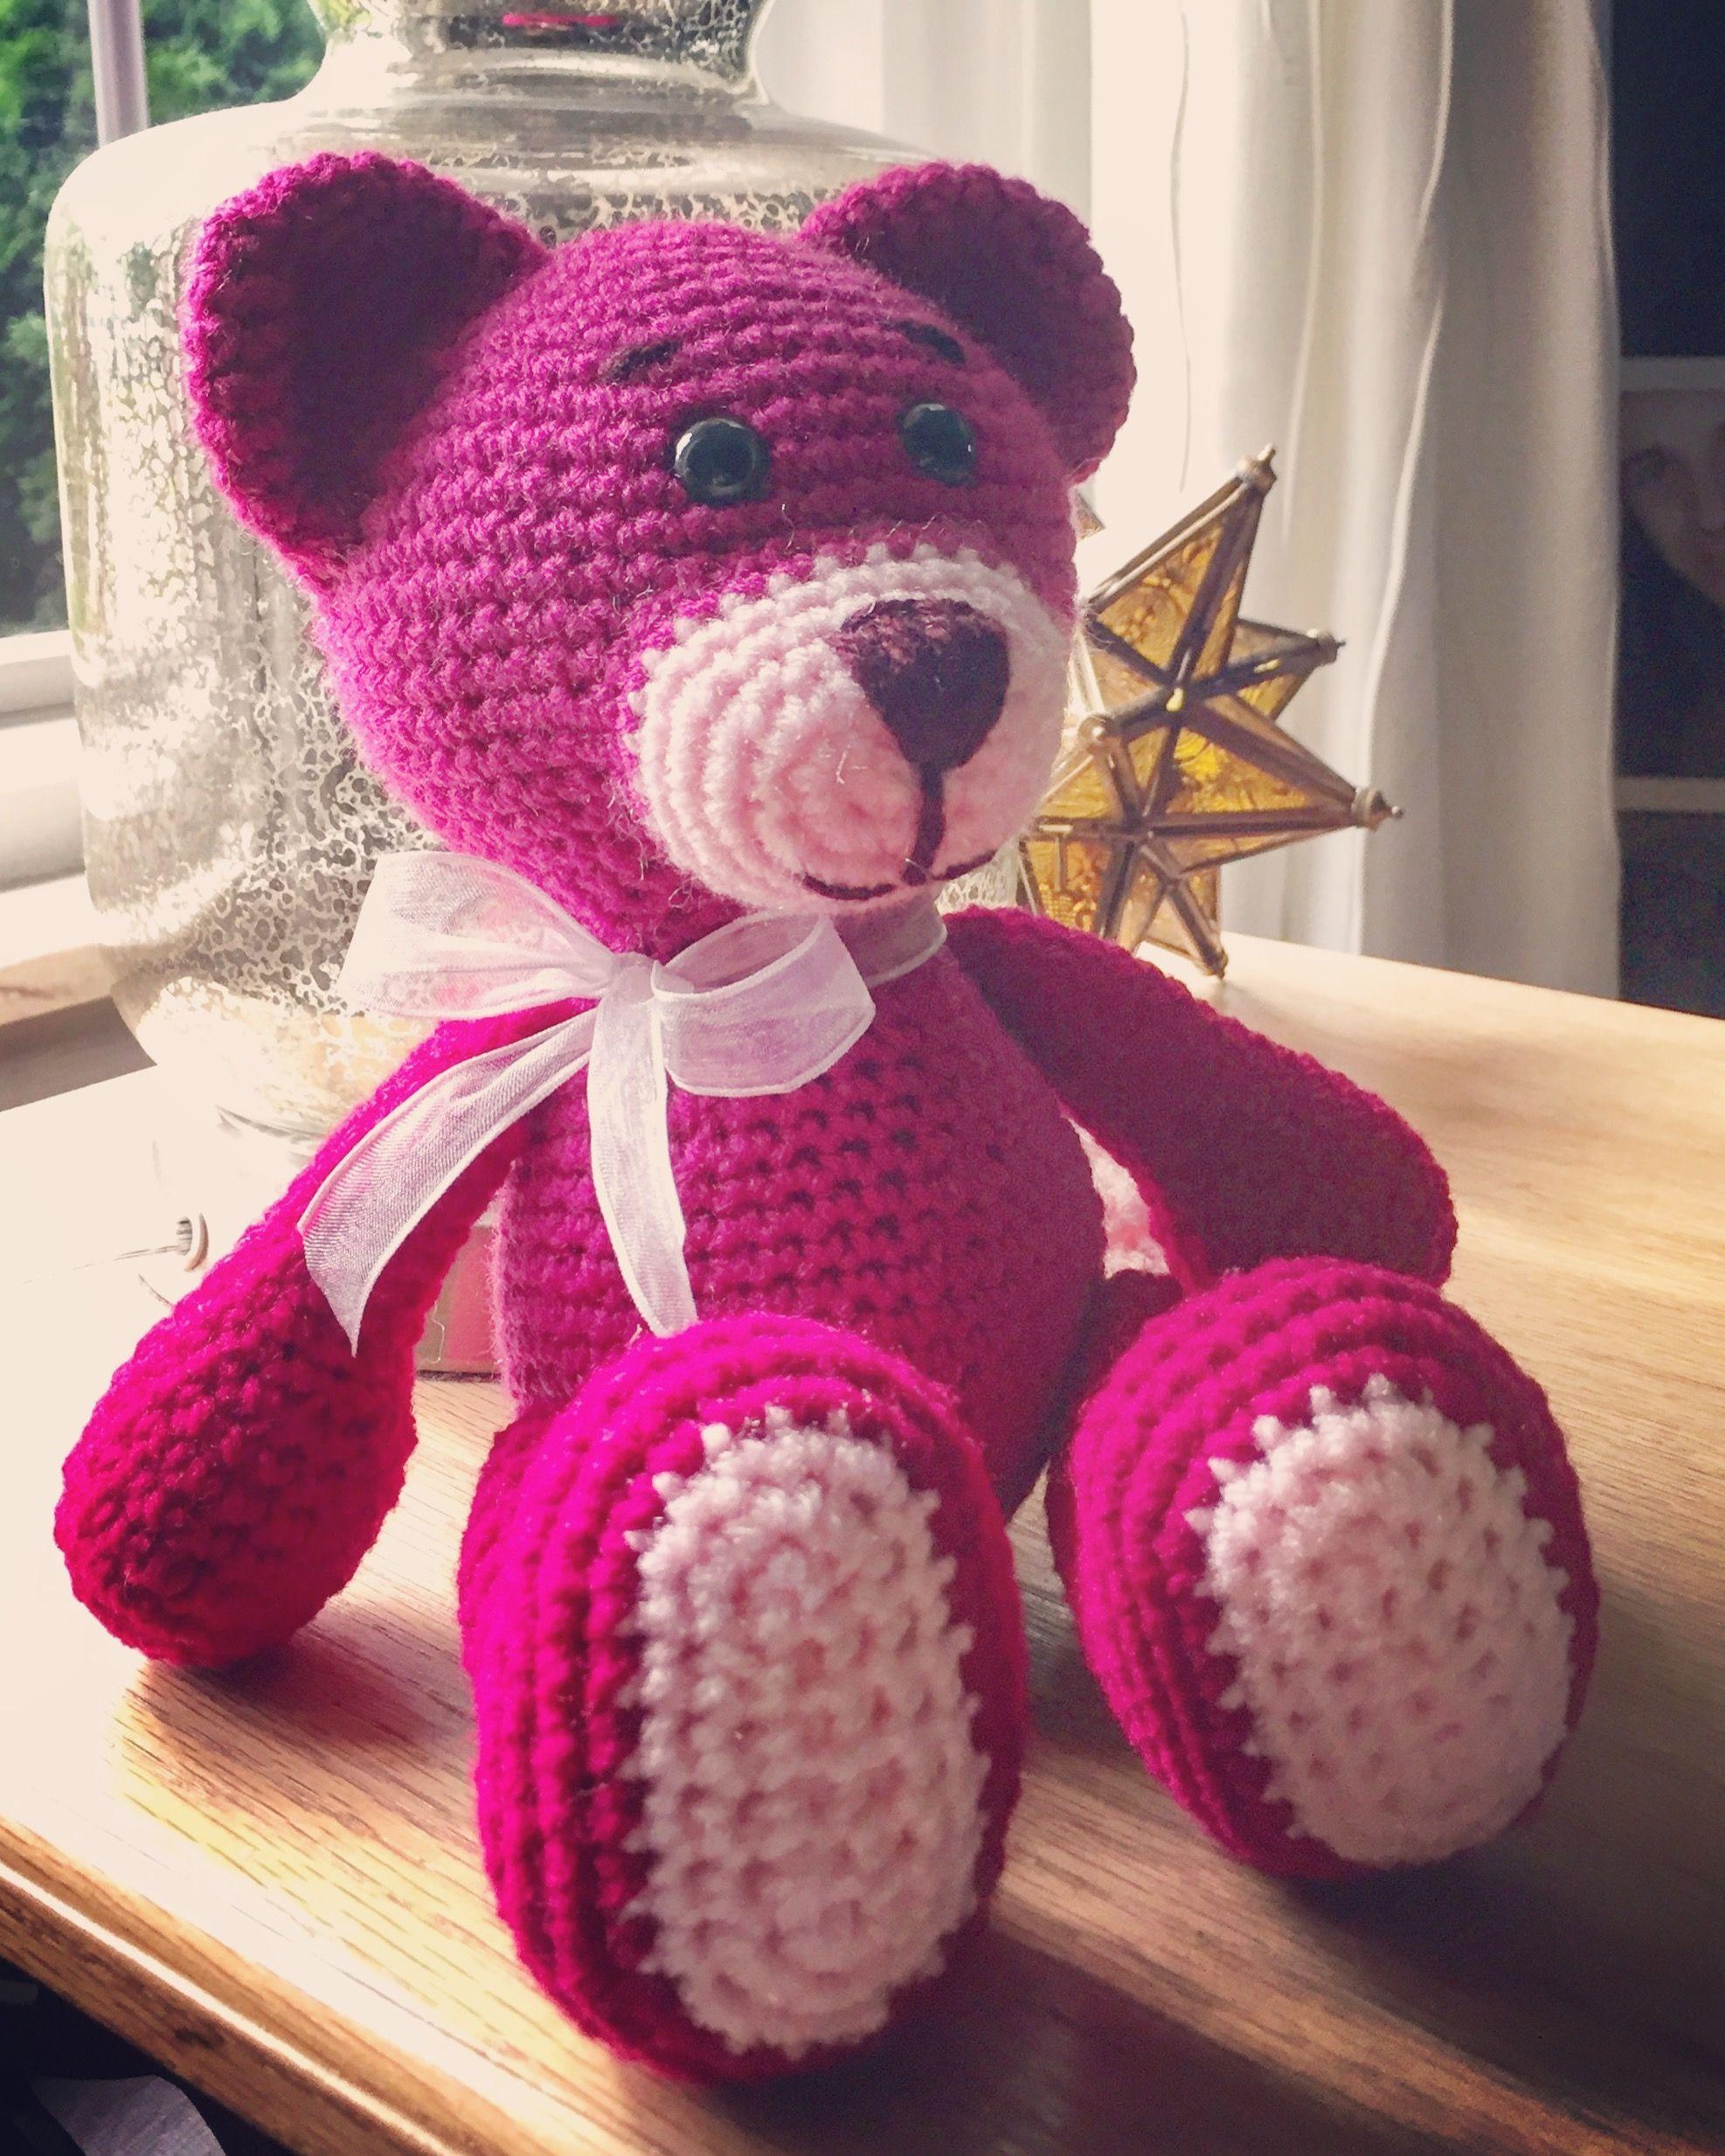 Hot pink teddy bear crocheted crochet plushy toy plush